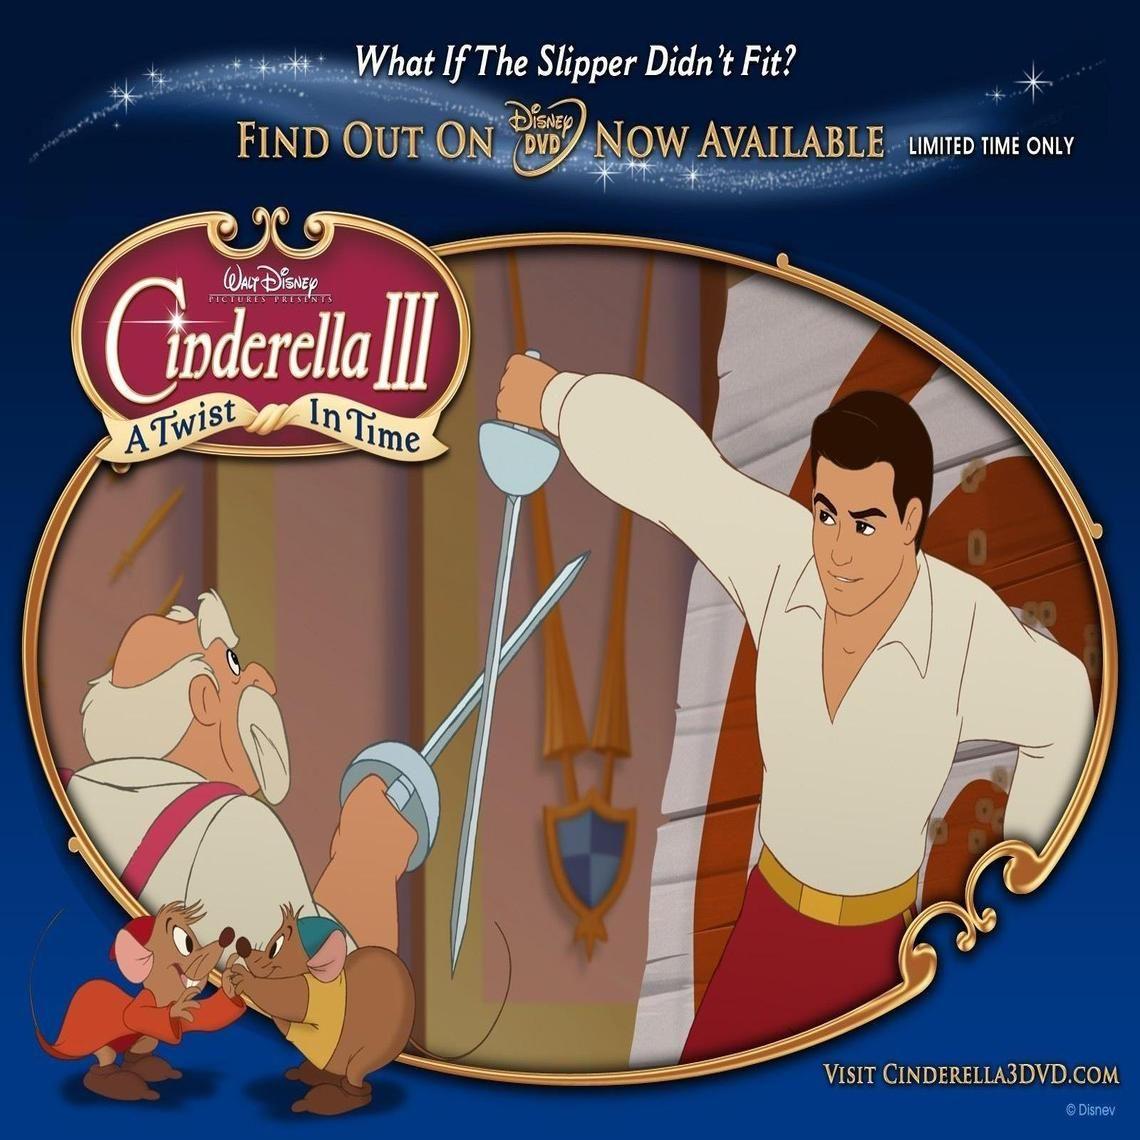 Cinderella 3 A Twist In Time Cinderella 3 Cinderella Fairy